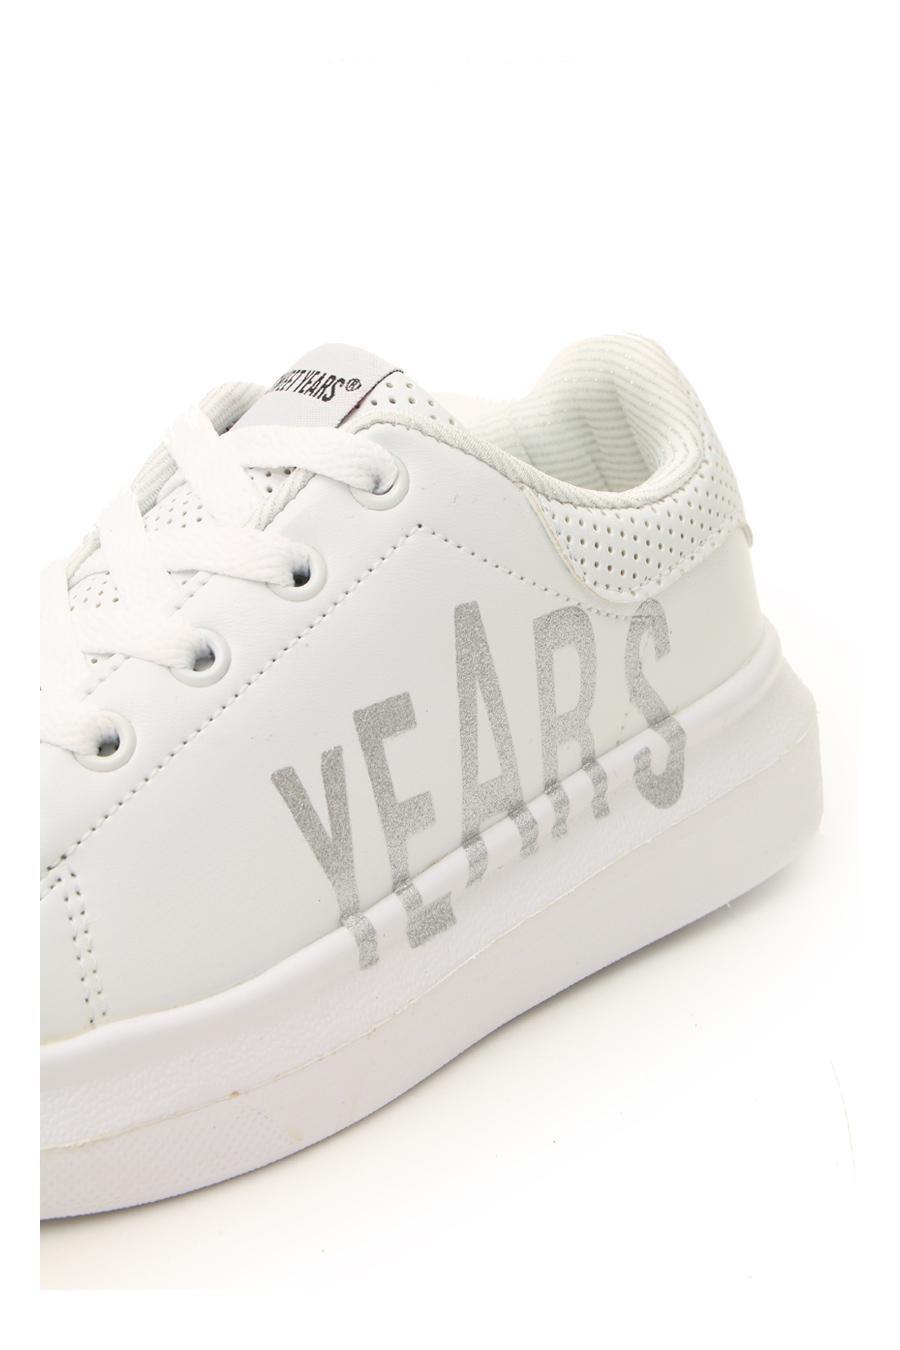 SNEAKERS SWEET YEARS 728 bambina bianco   Pittarello